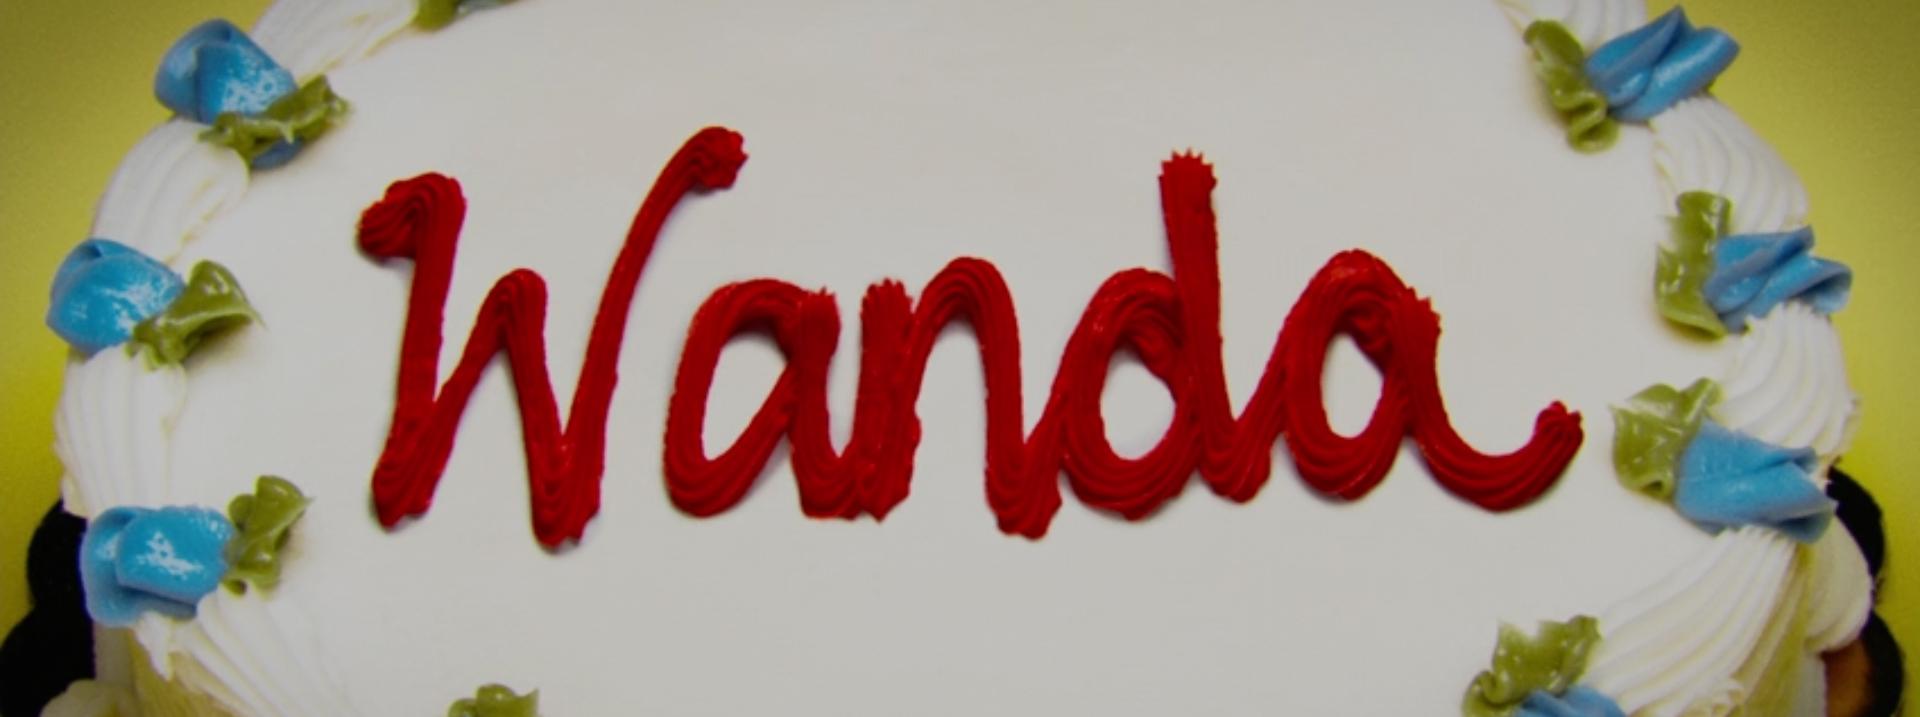 WandaVision: Breaking the Fourth Wall. Image Credit: Disney+.